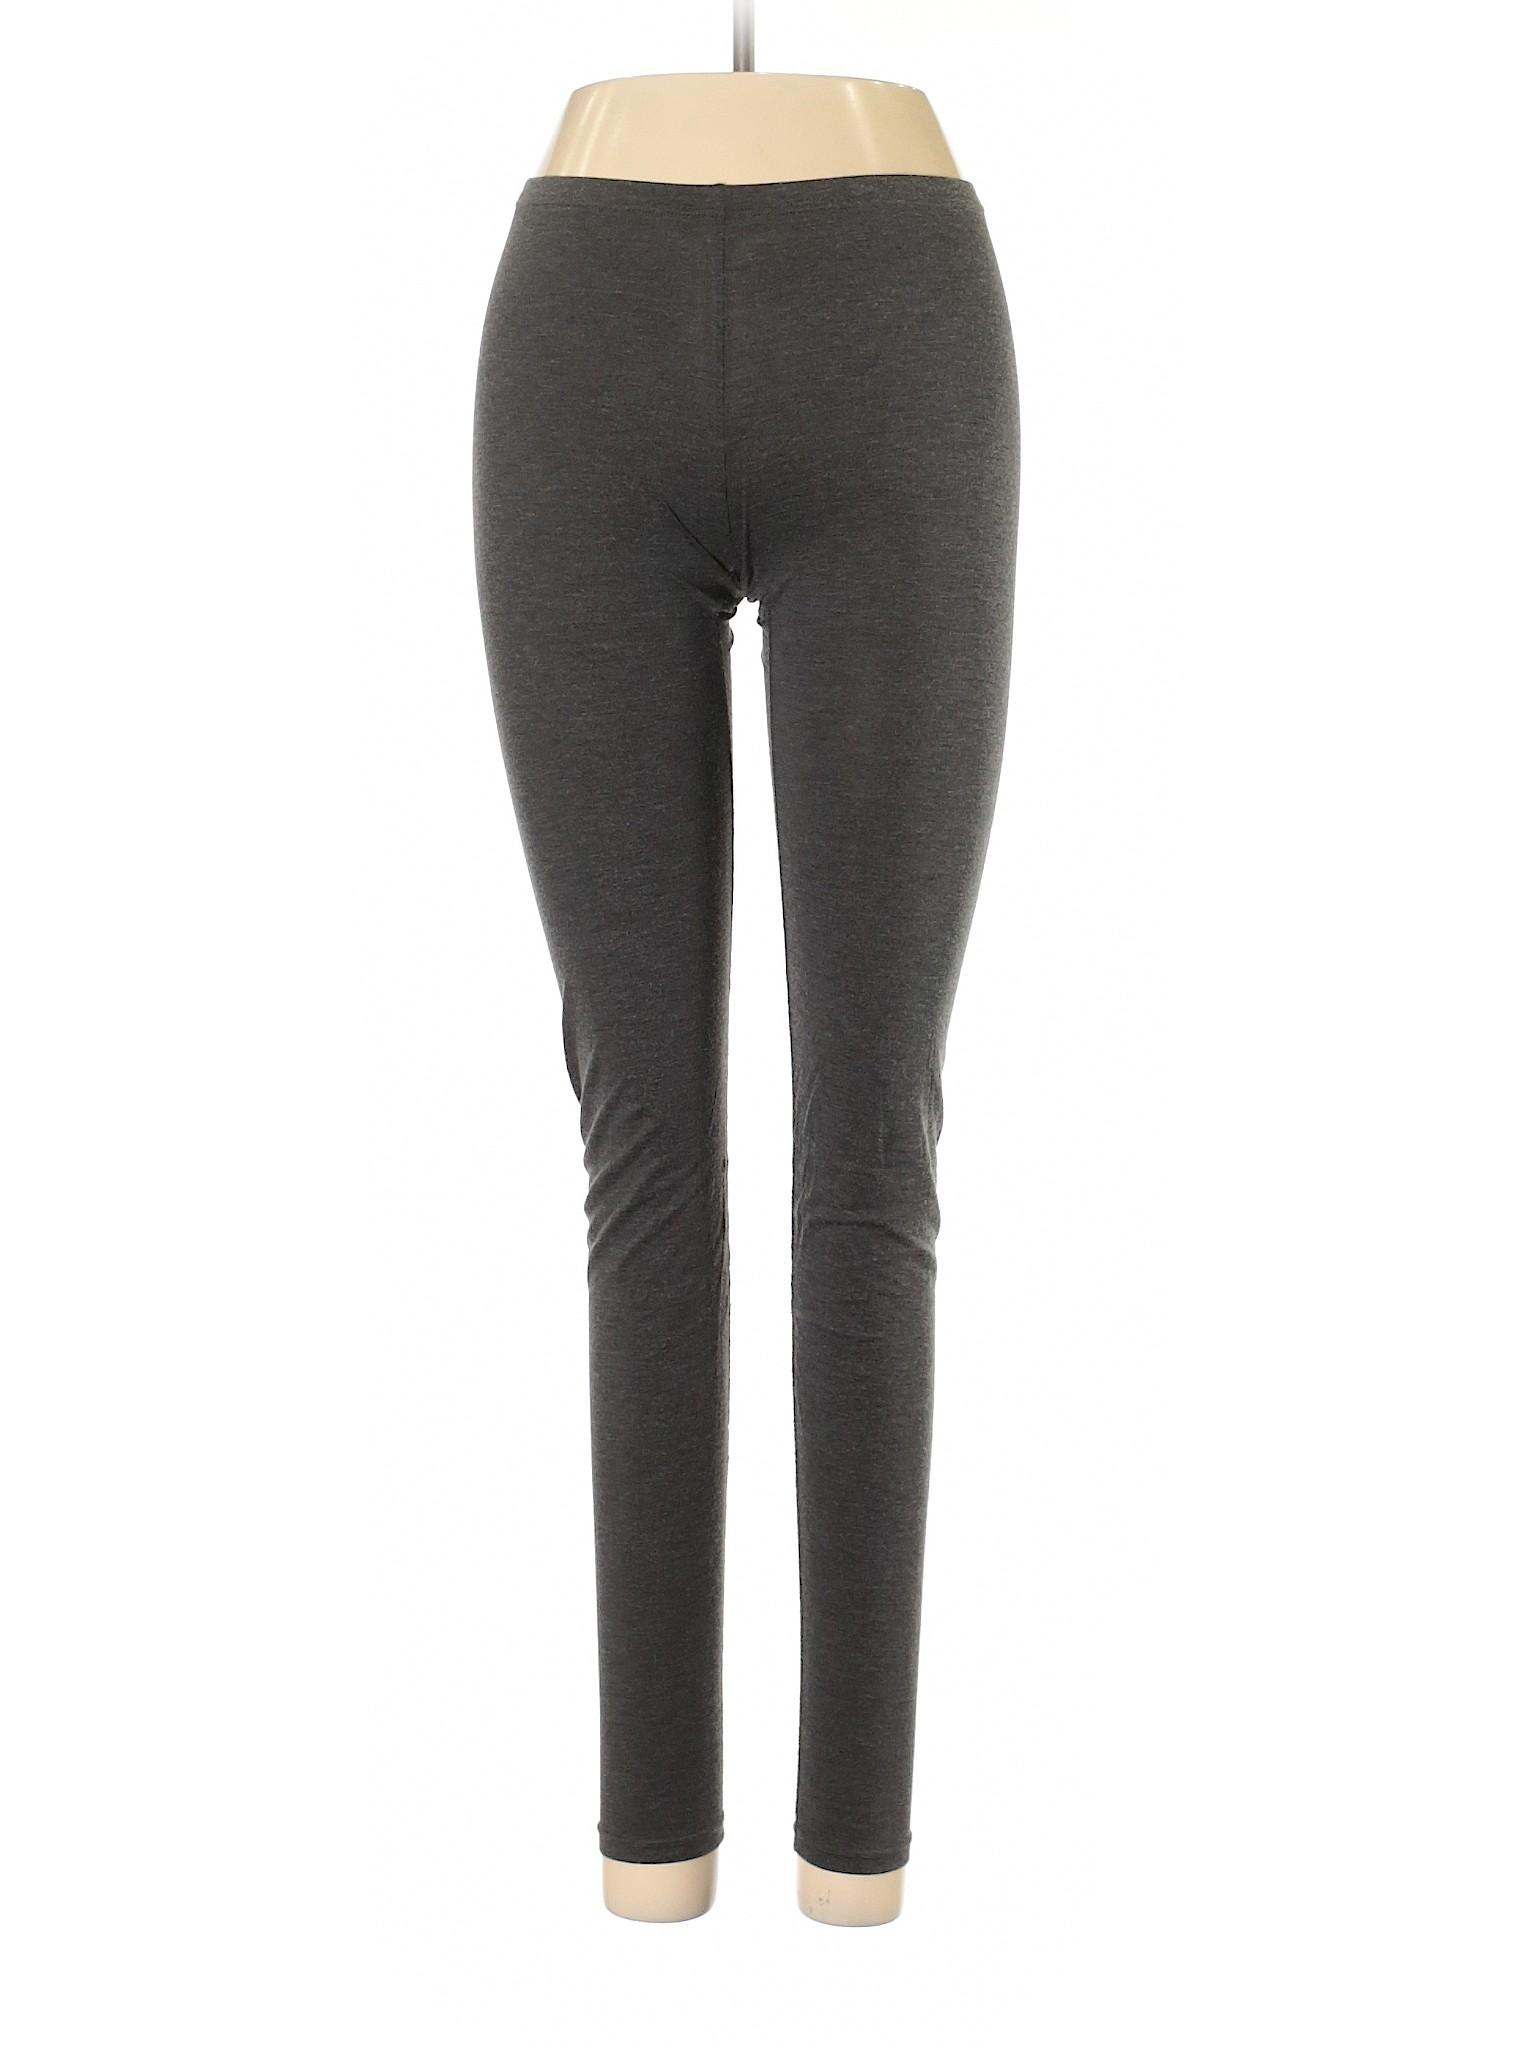 Uniqlo Women Gray Leggings S Ebay